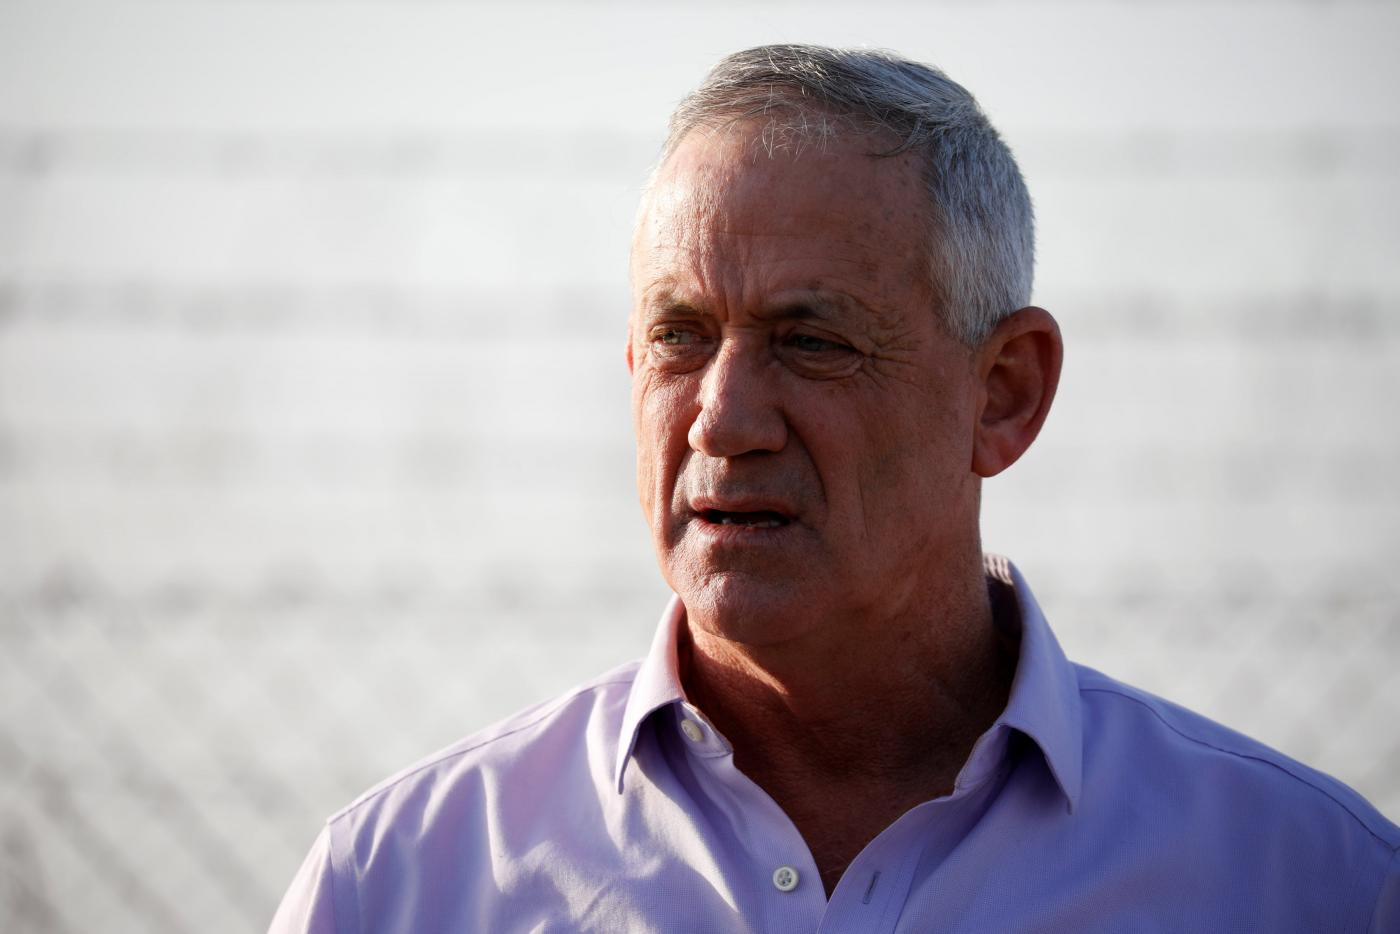 Former Mossad chief says Gantz phone hack leak 'an attack on